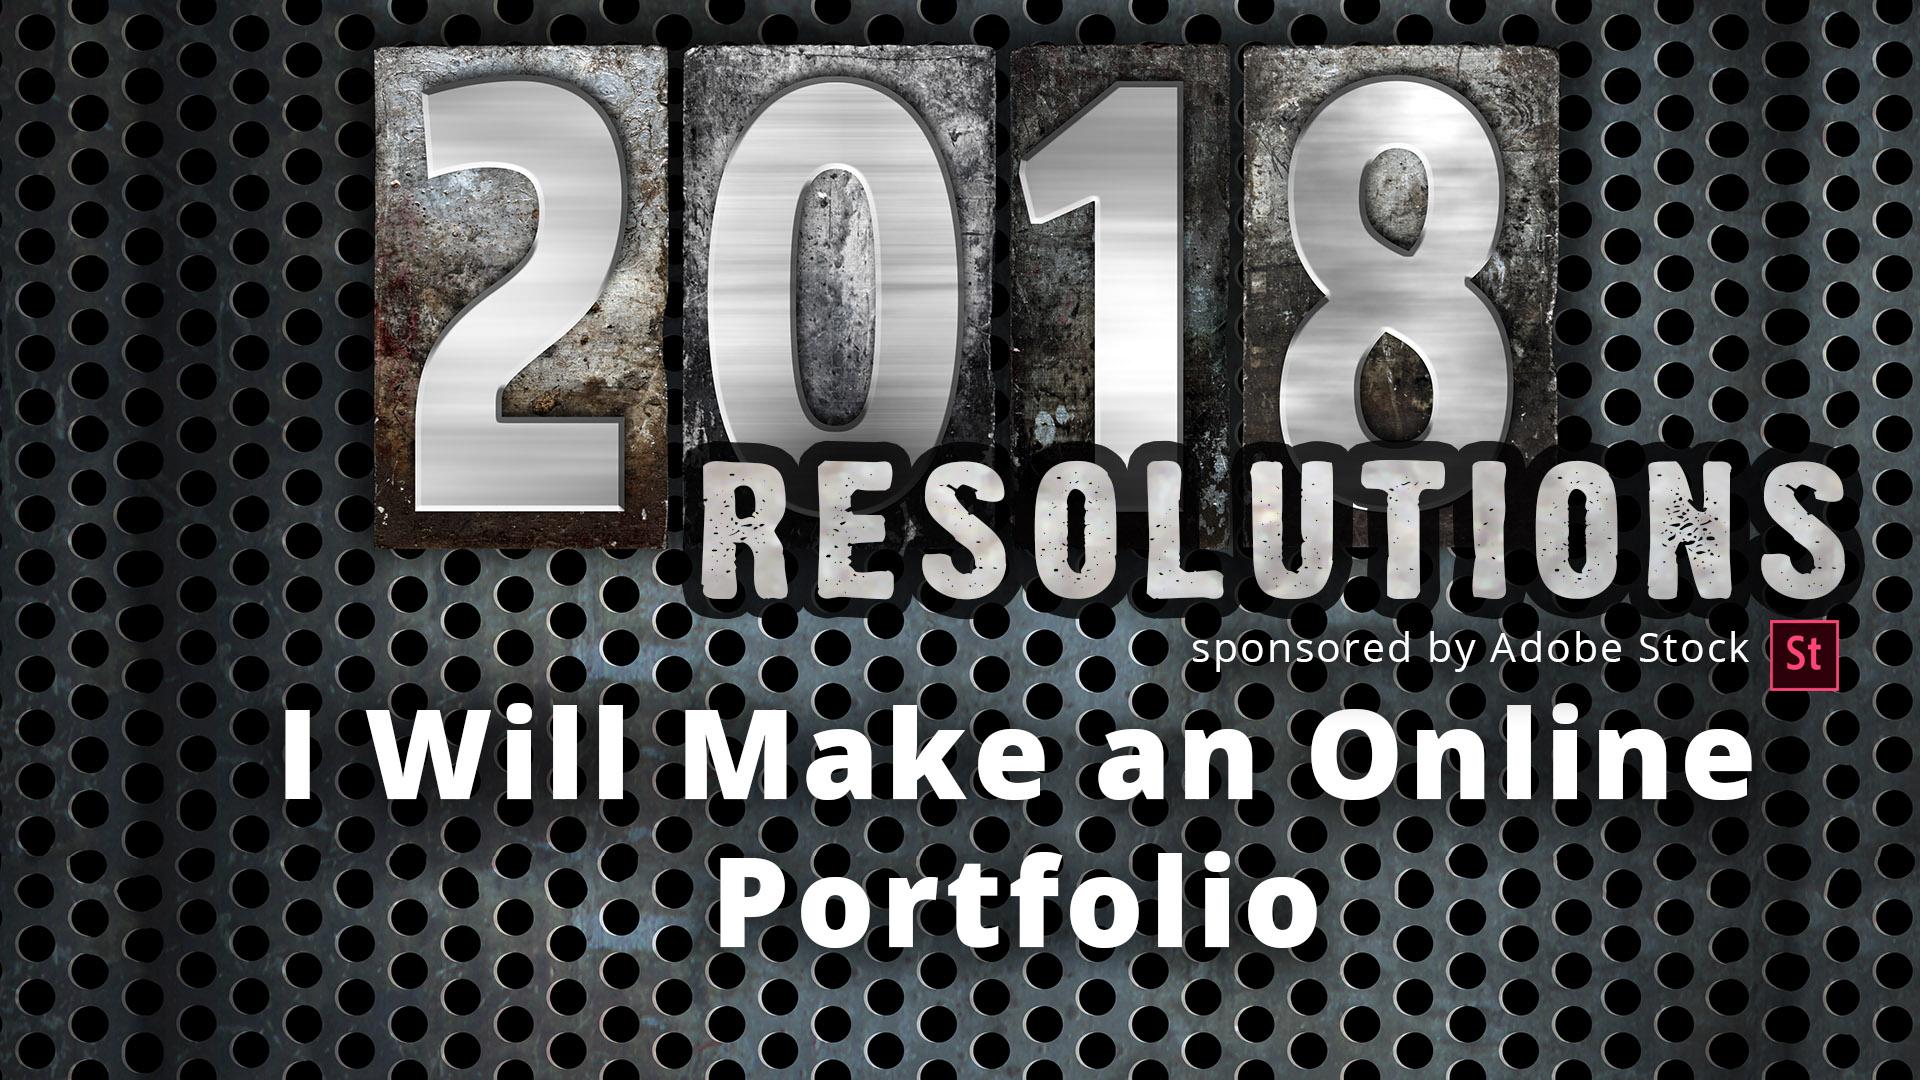 I Will Make Online Portfolios webinar sponsored by Adobe Stock